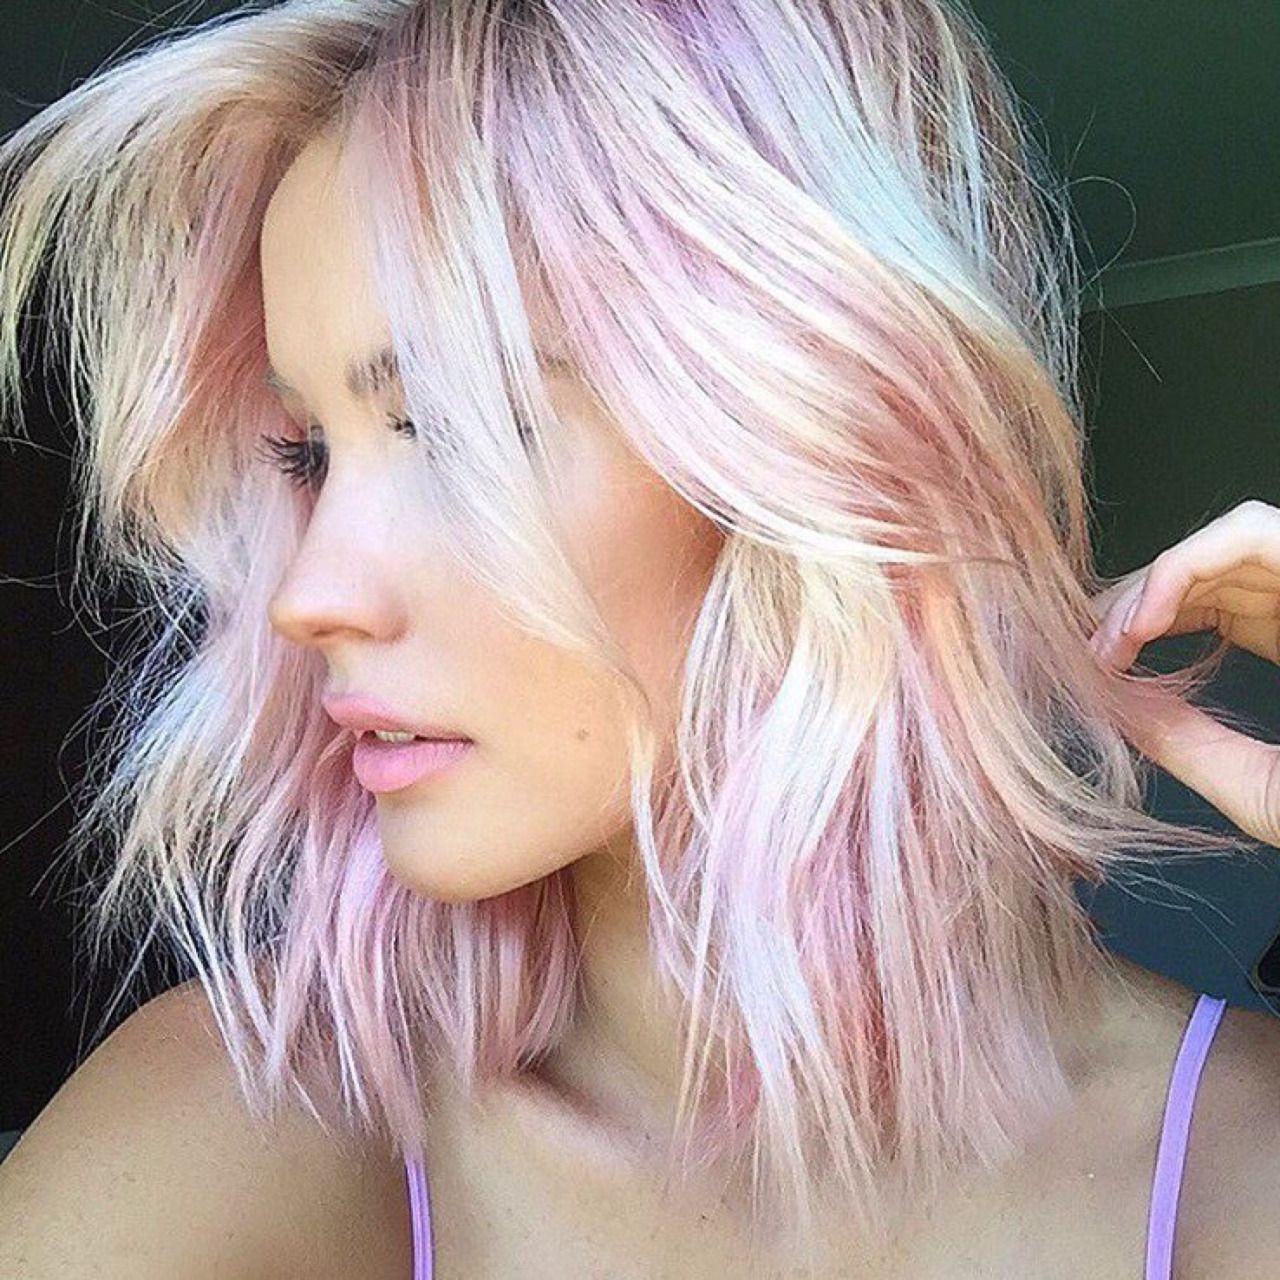 Pin auf Haarfarben   Trends   Färbetechniken   Ideen